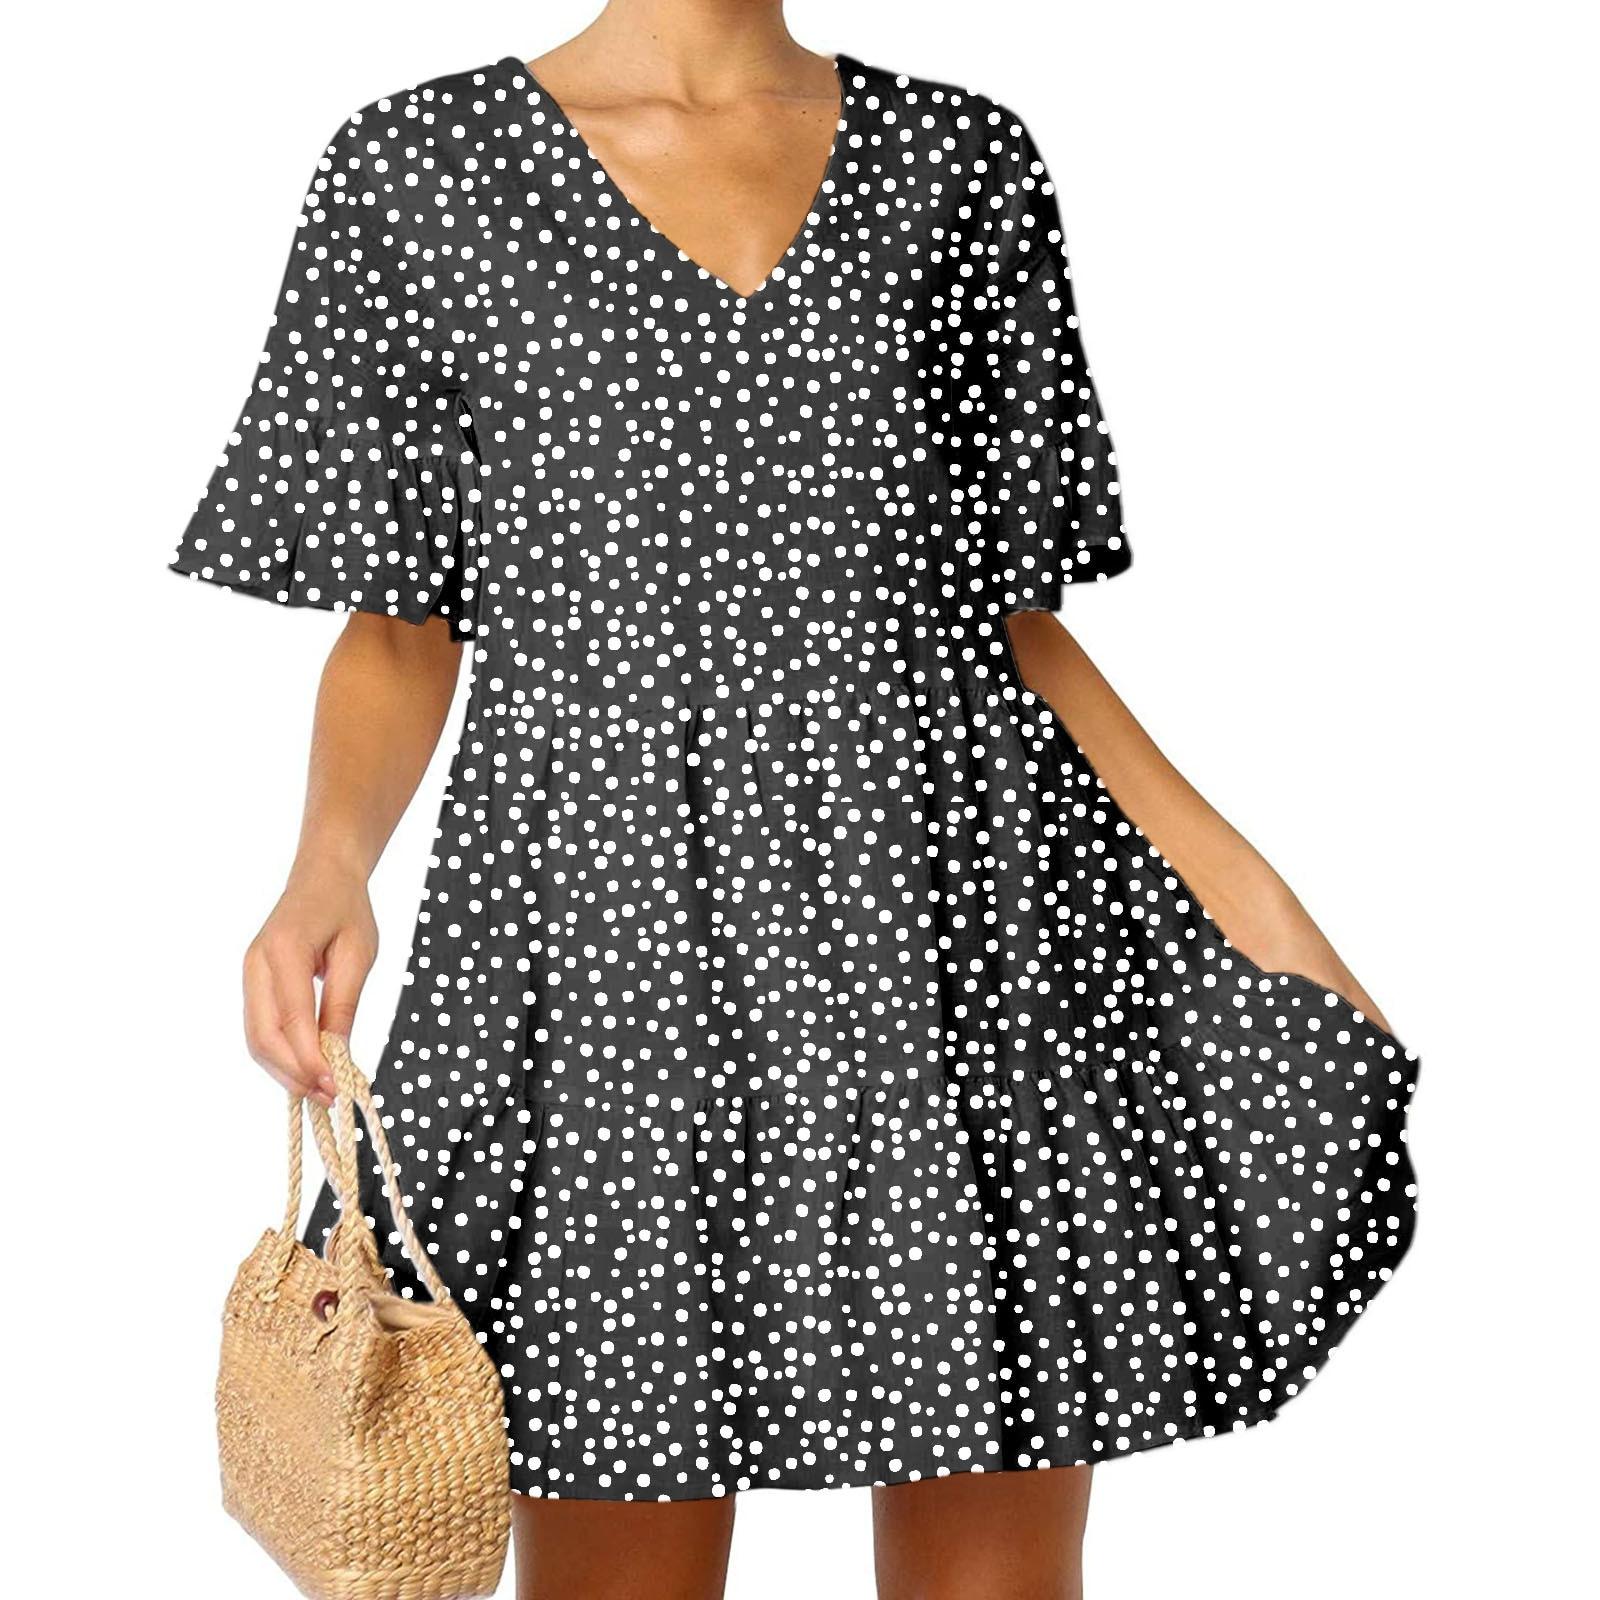 40# Leopard Ruffle Dress Woman Flare Sleeve V Neck Loose Tunic Mini Dress With Pockets Oversized Summer Dress 2021 Vestidos